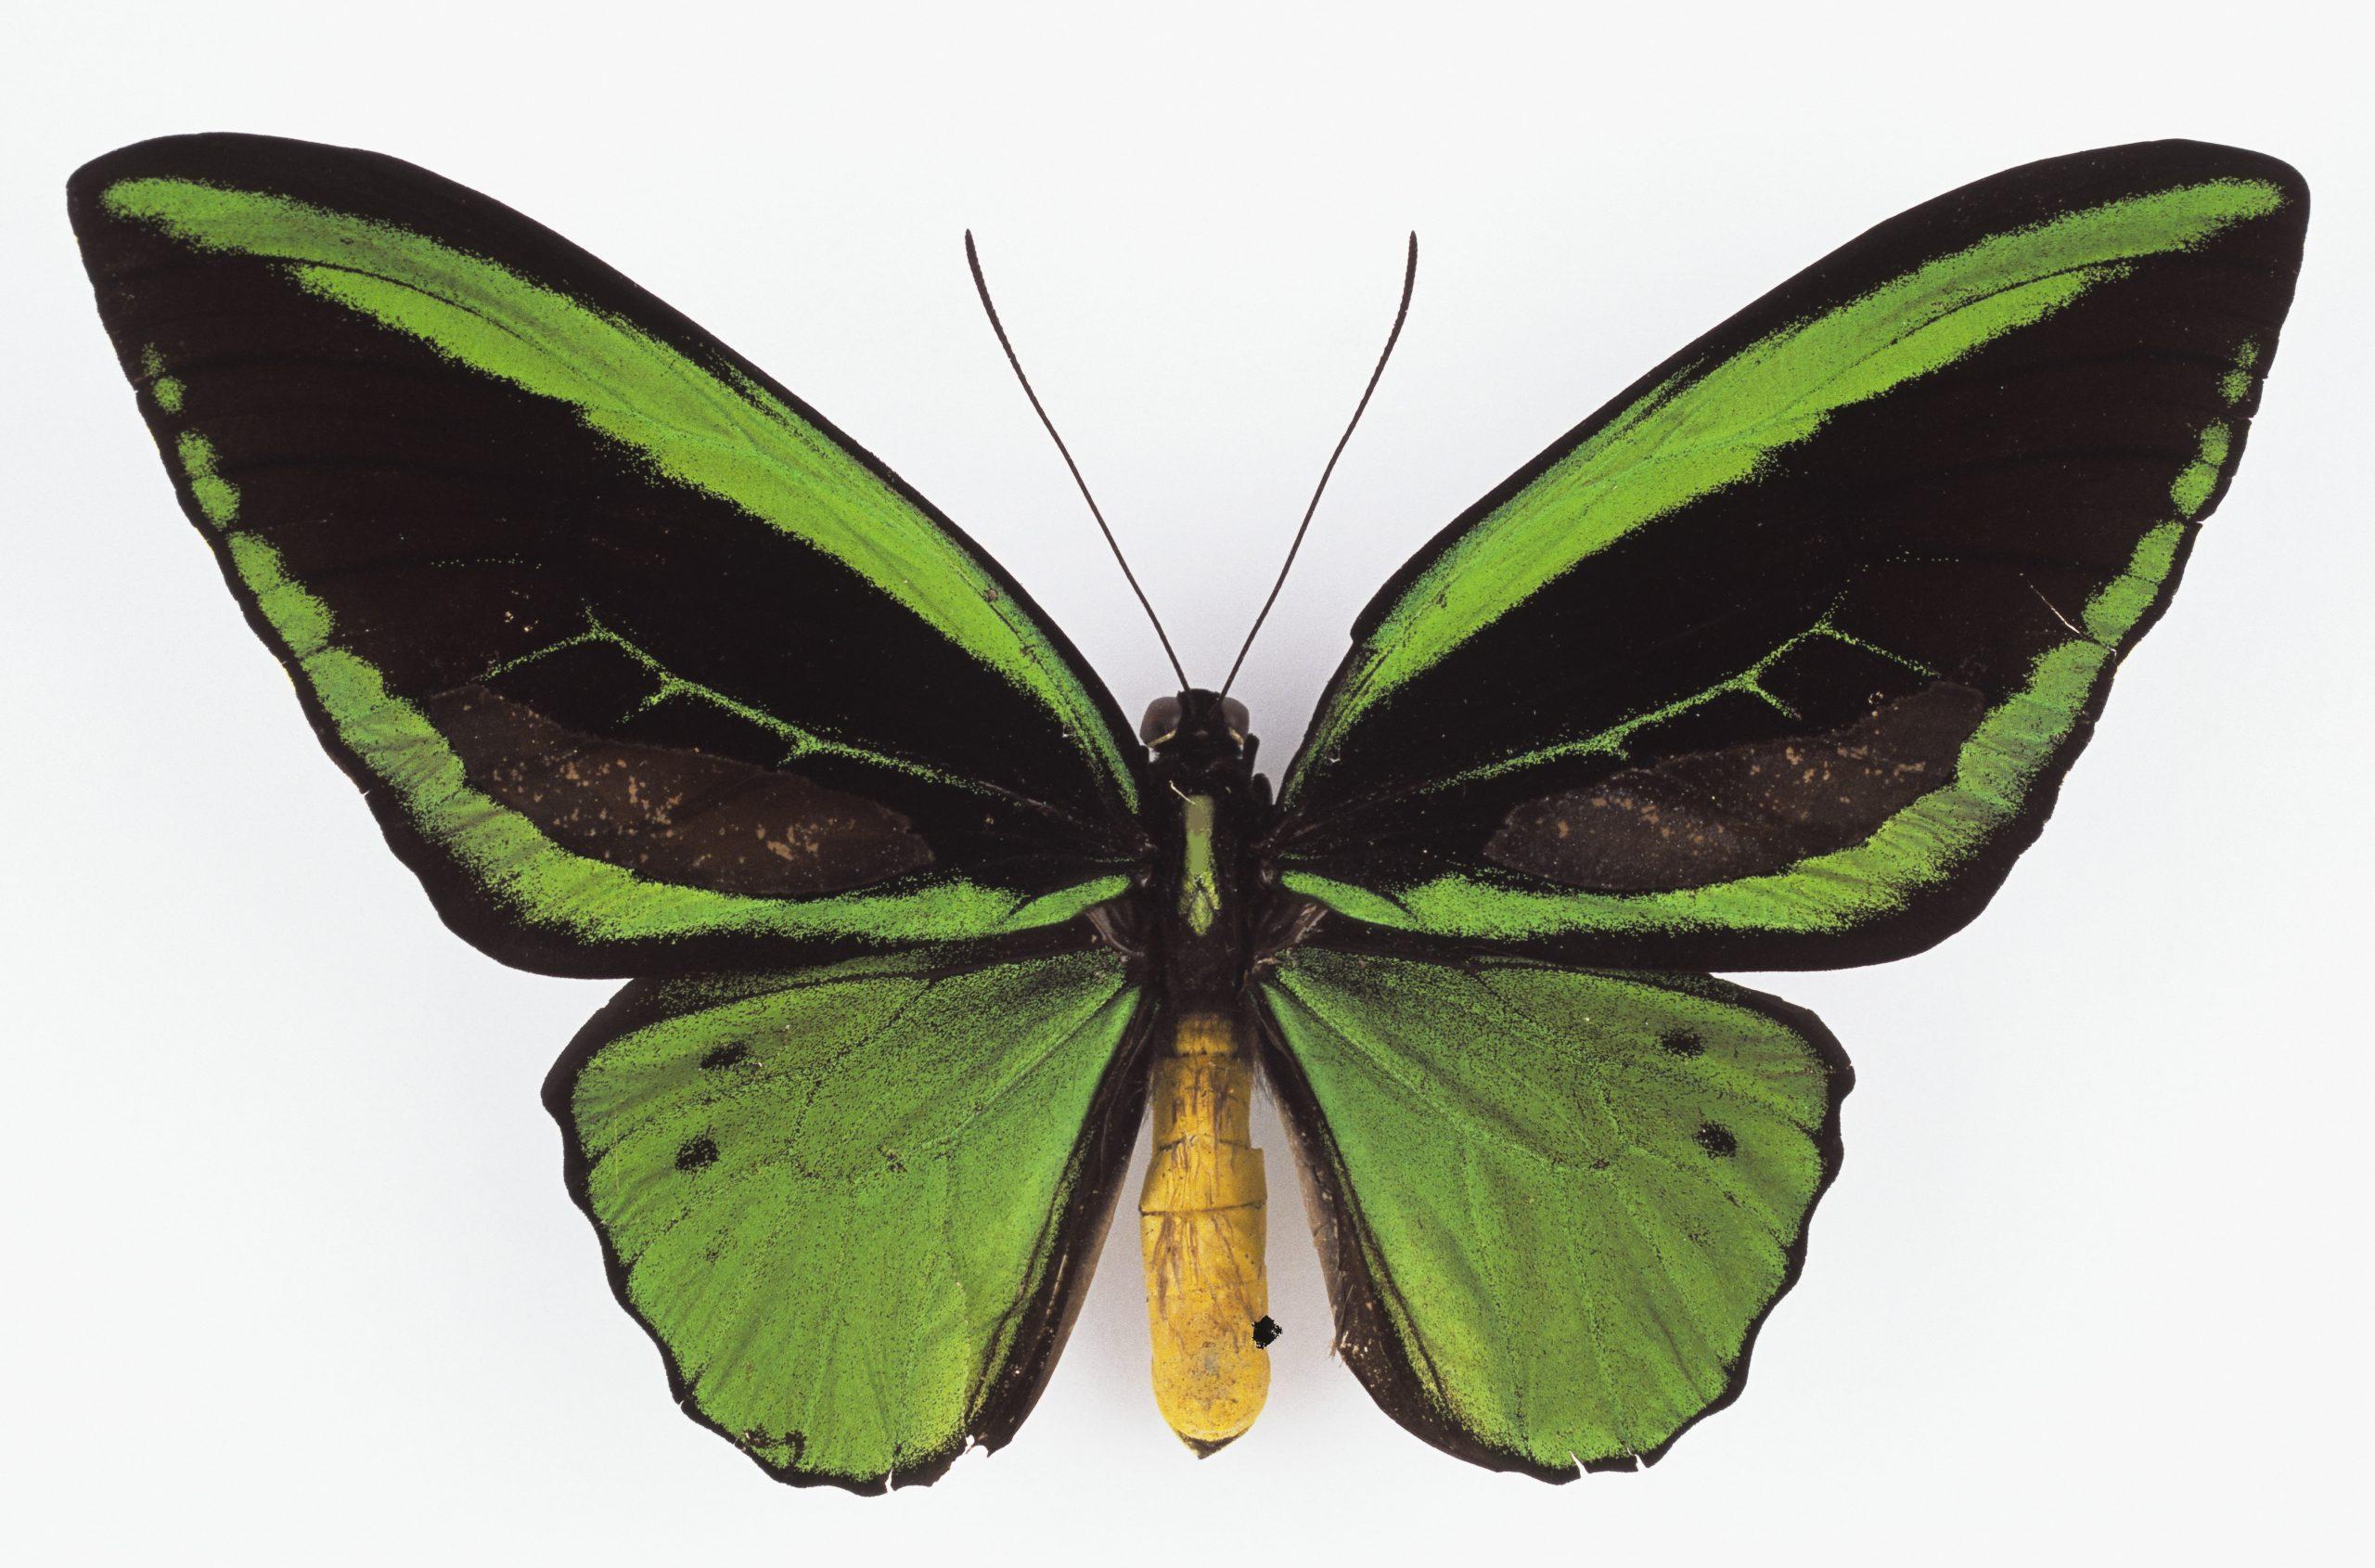 Fot. 2_ Ornithoptera priamus ssp. poseidon, Papua Nowa Gwinea